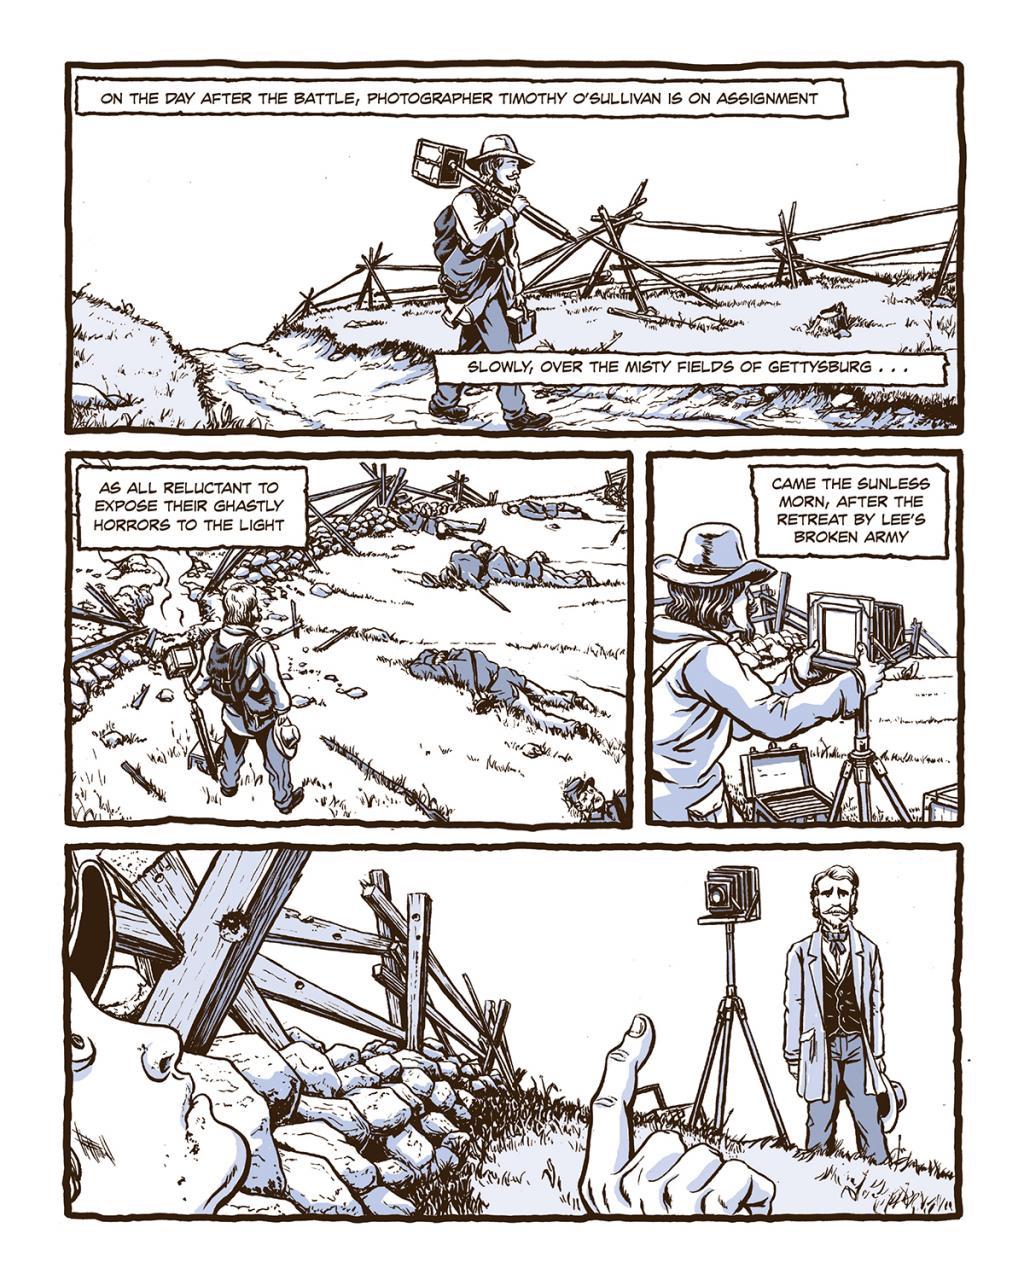 Gettysburg_Illustration_3